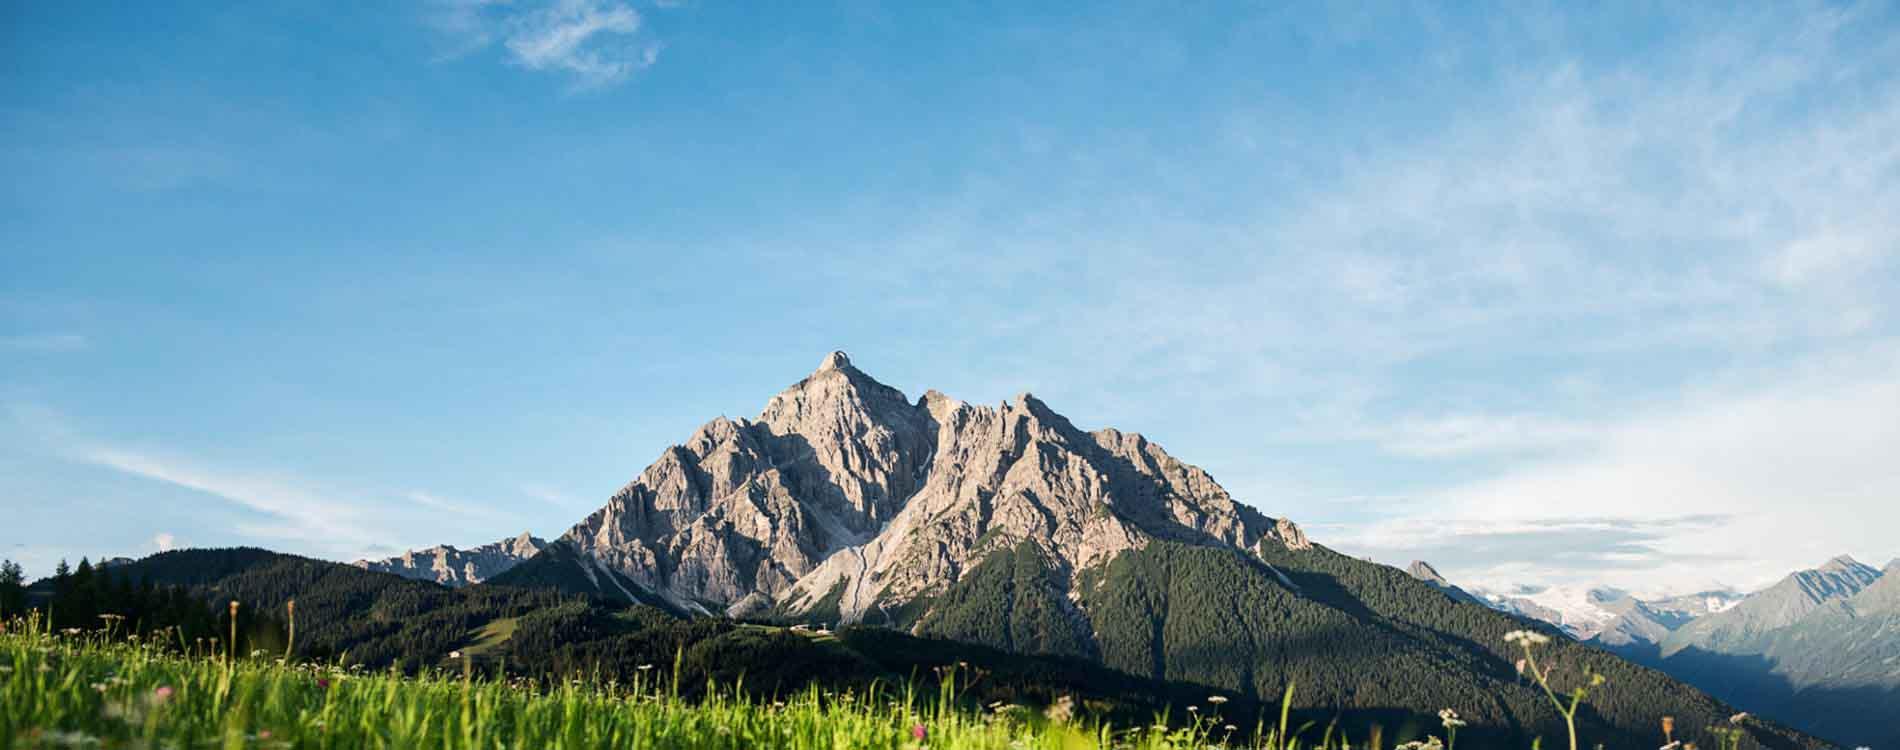 Alpine hiking break in the Stubai Valley at 5-star SPA-HOTEL Jagdhof